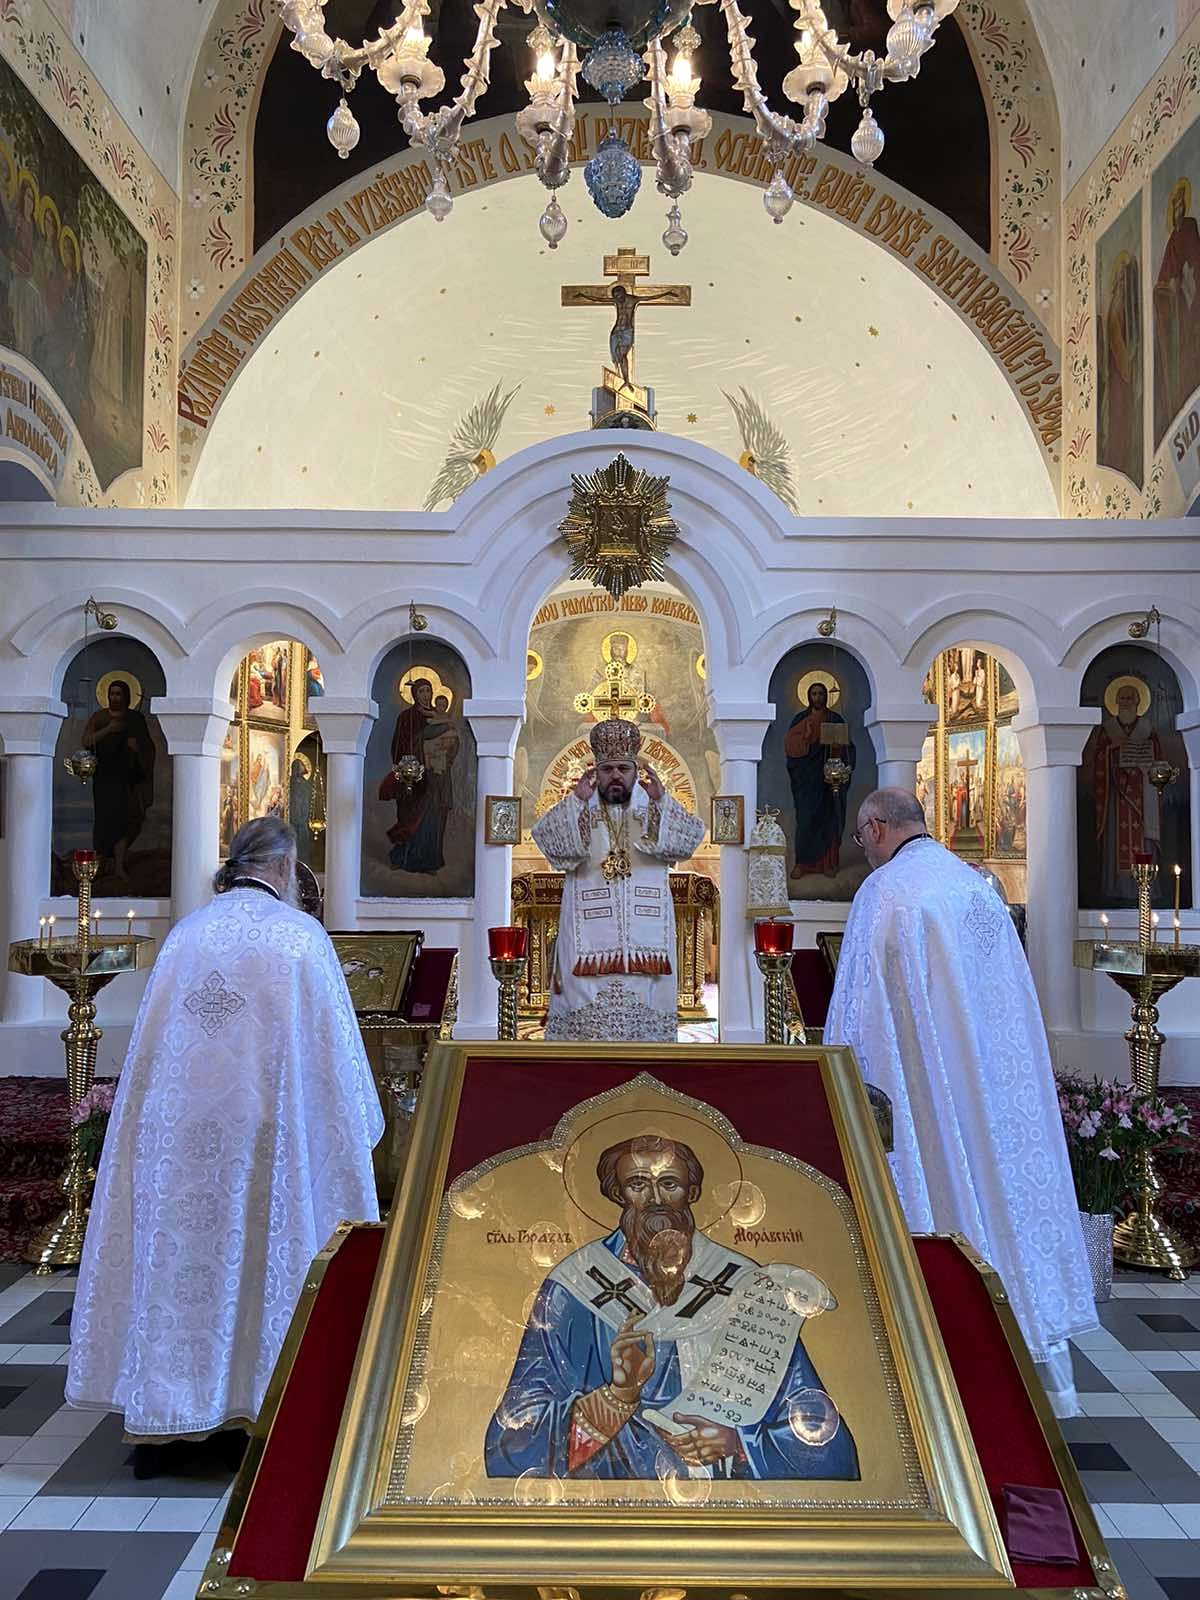 2021-06-01-presbyterium-liturgie-77-E57E76C8-6D7F-478C-99A3-B9632F2FAAAA_1